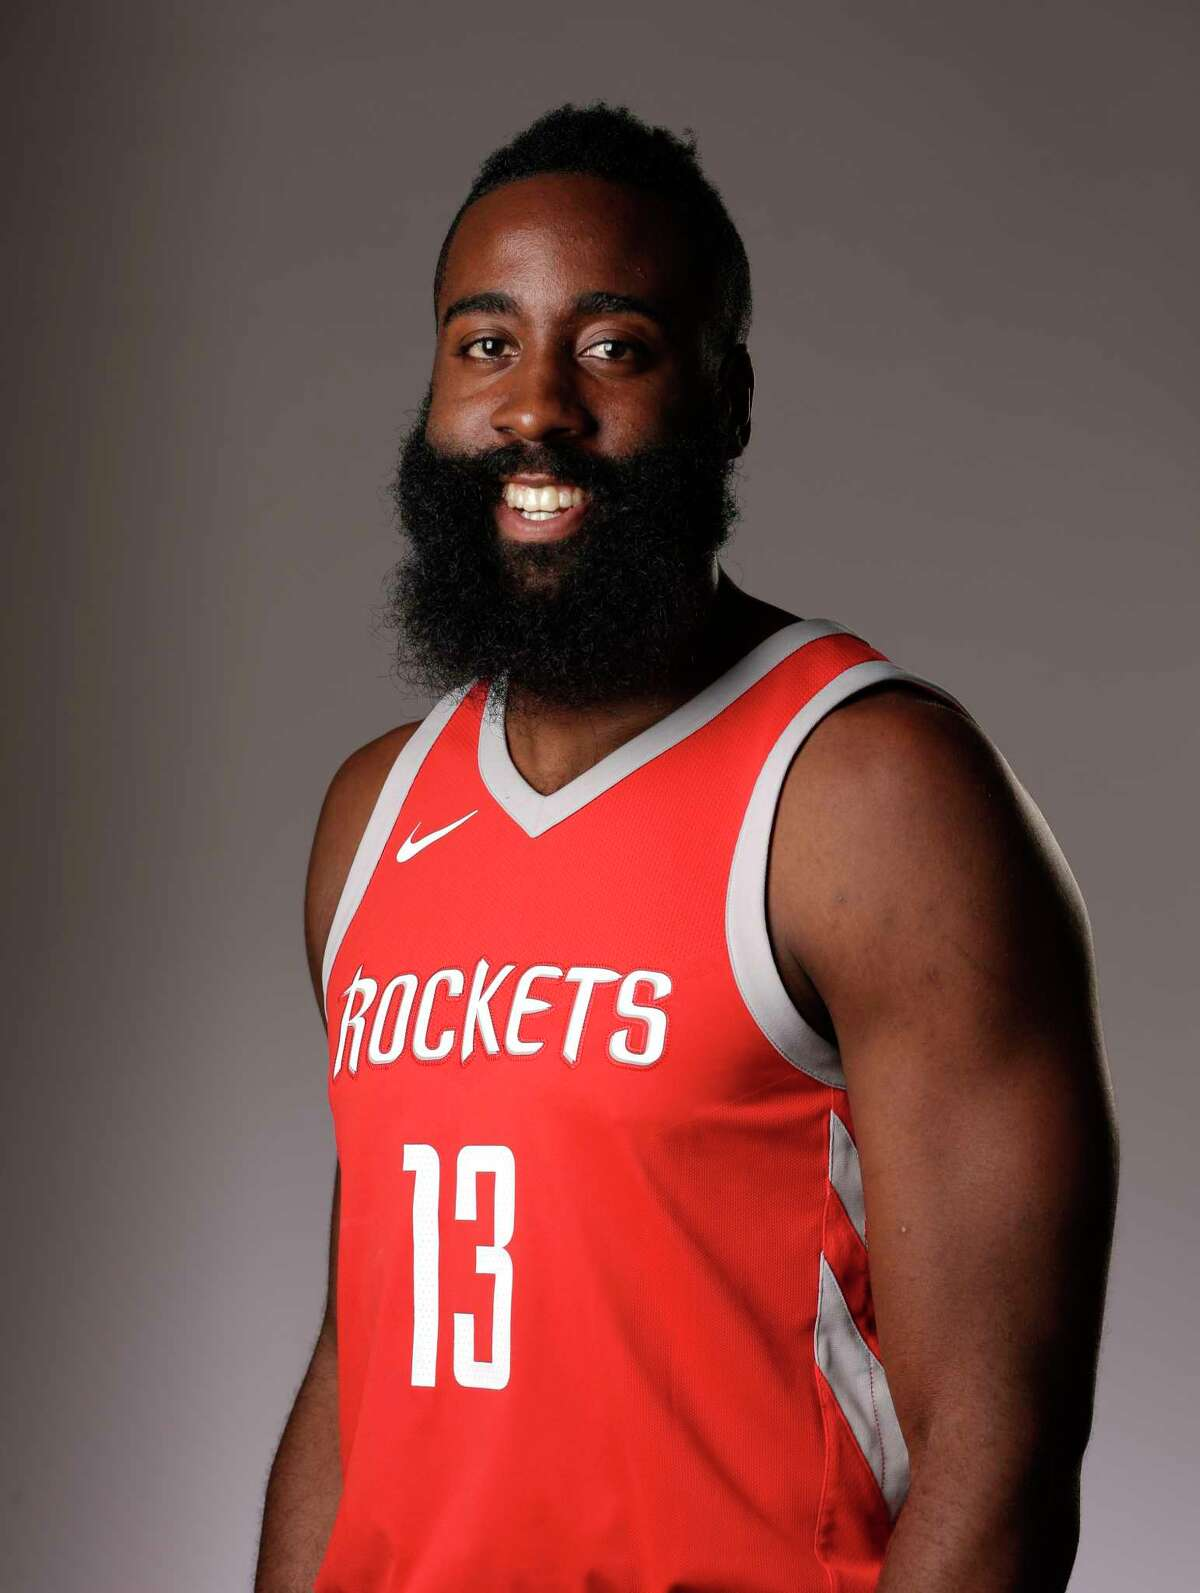 Houston Rockets' James Harden poses during a NBA basketball media day Monday, Sept. 25, 2017, in Houston. (AP Photo/Michael Wyke)